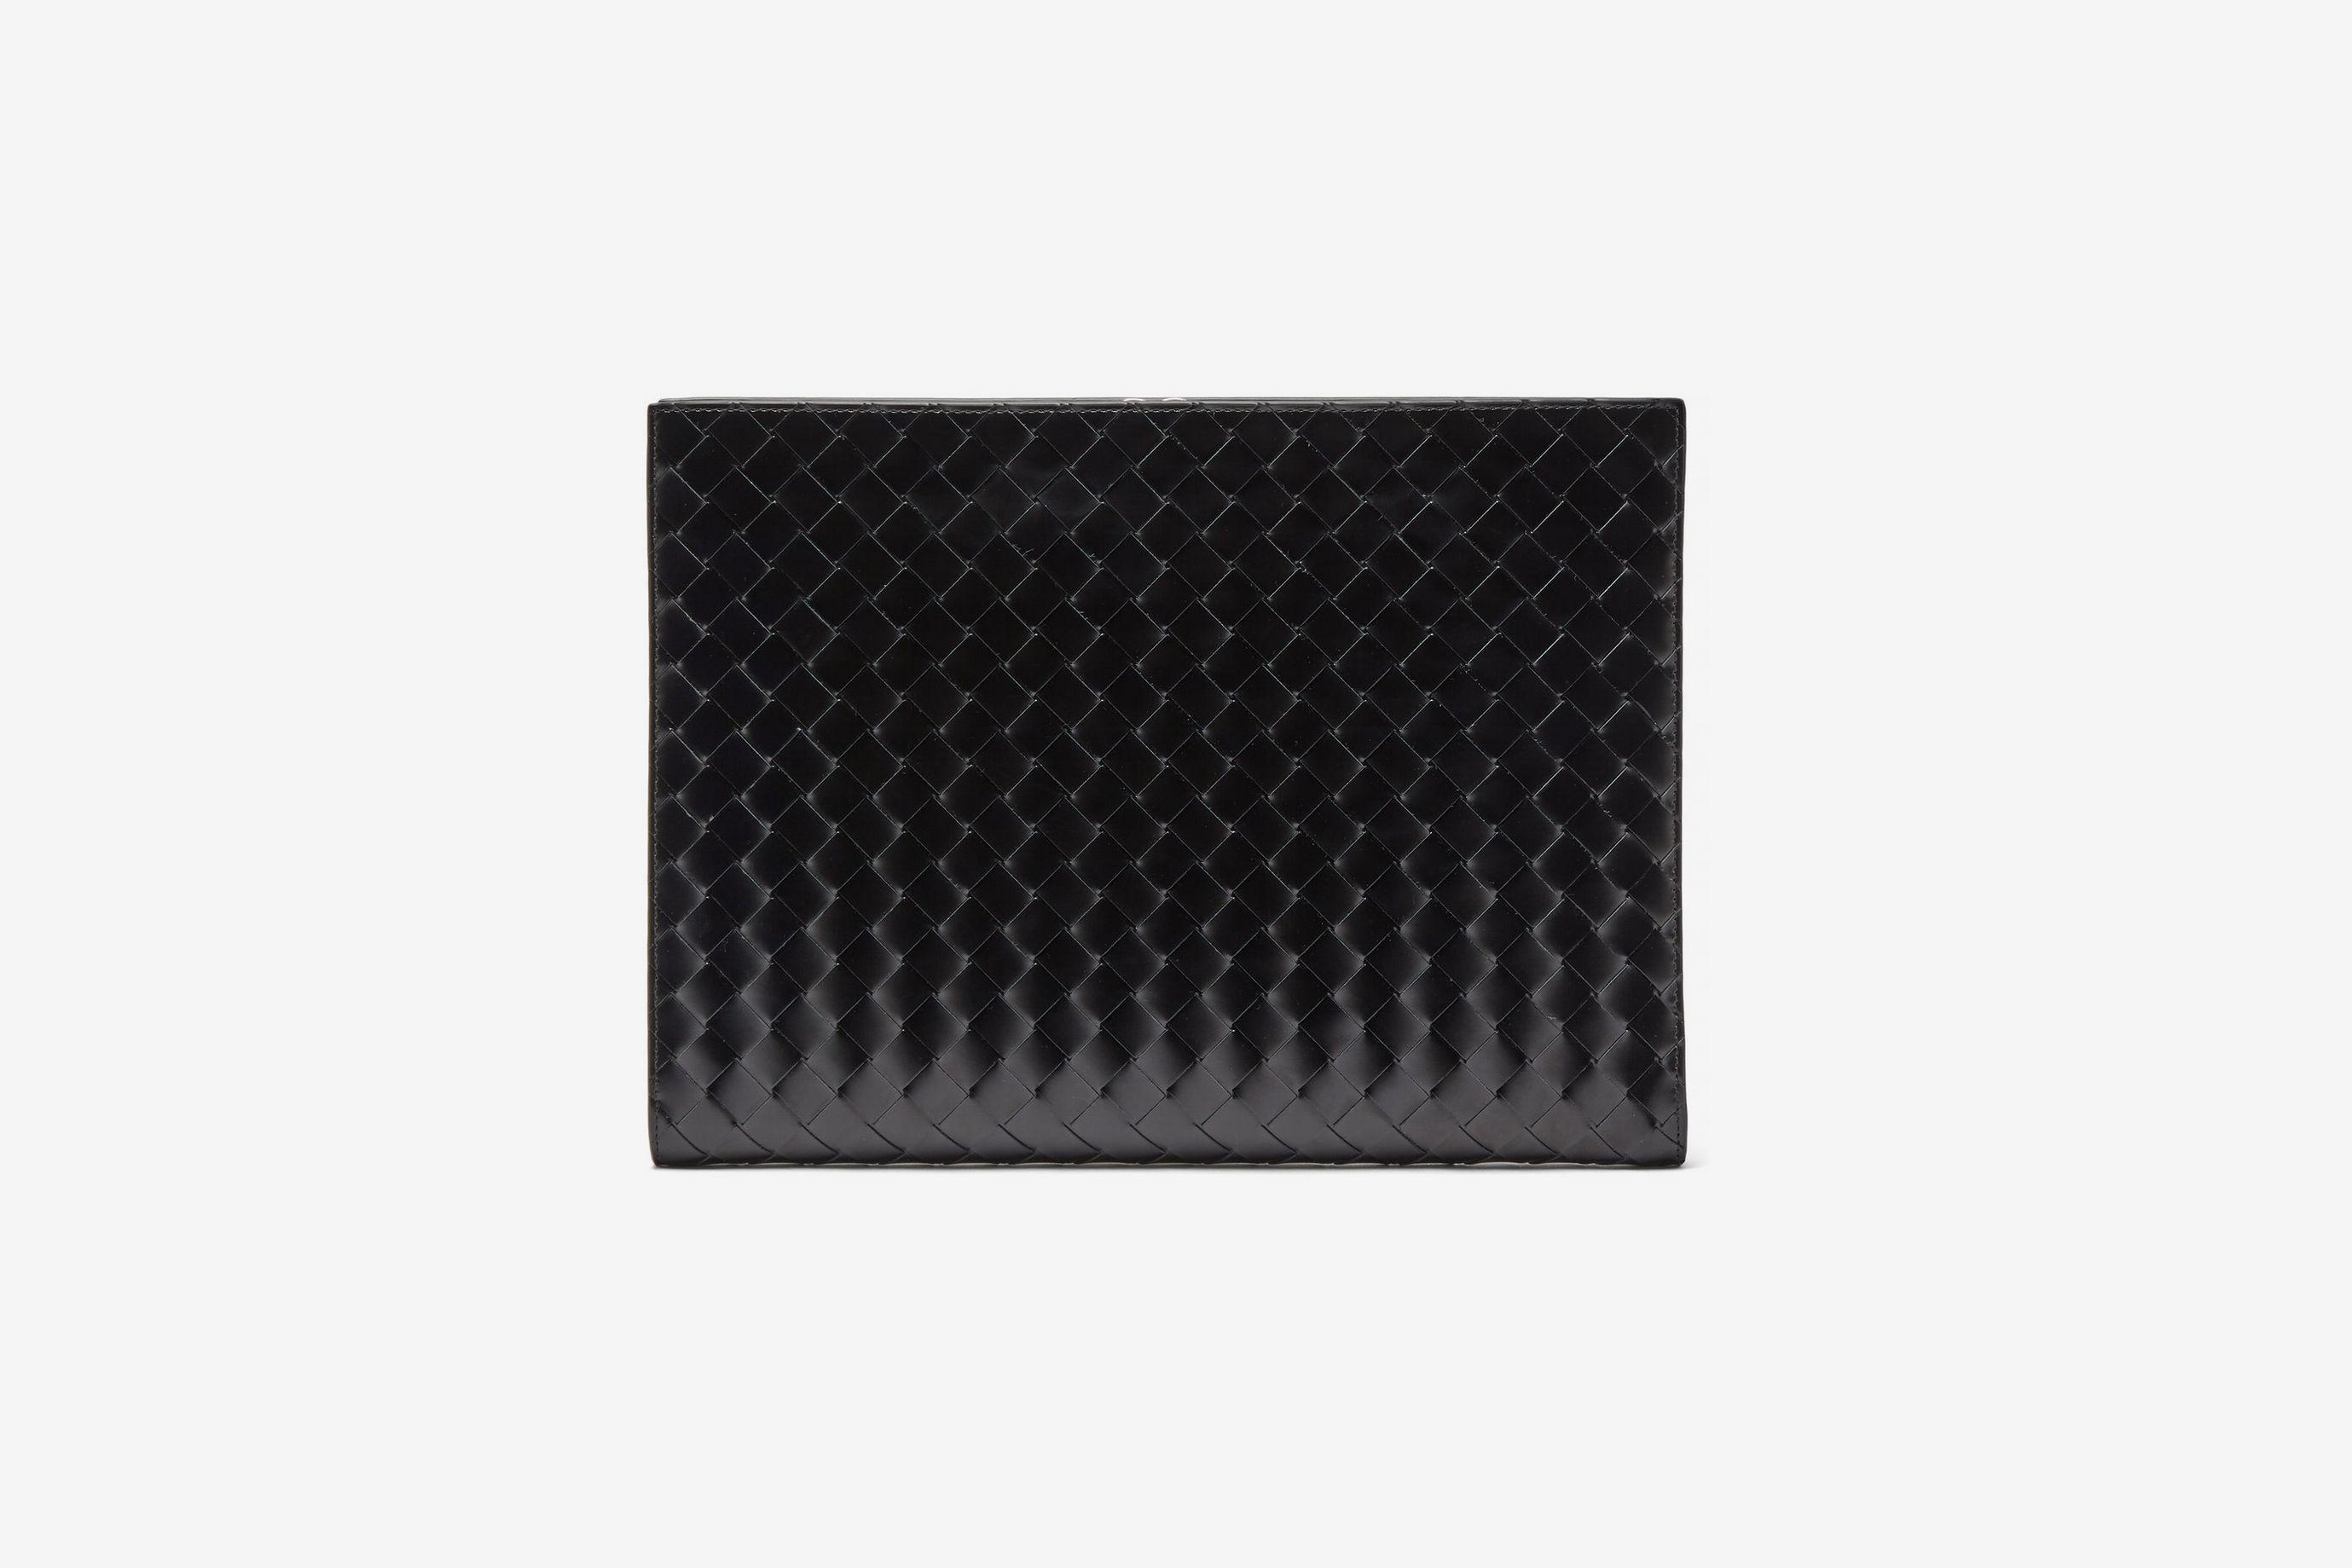 Bottega Veneta Intrecciato-Leather Document Holder